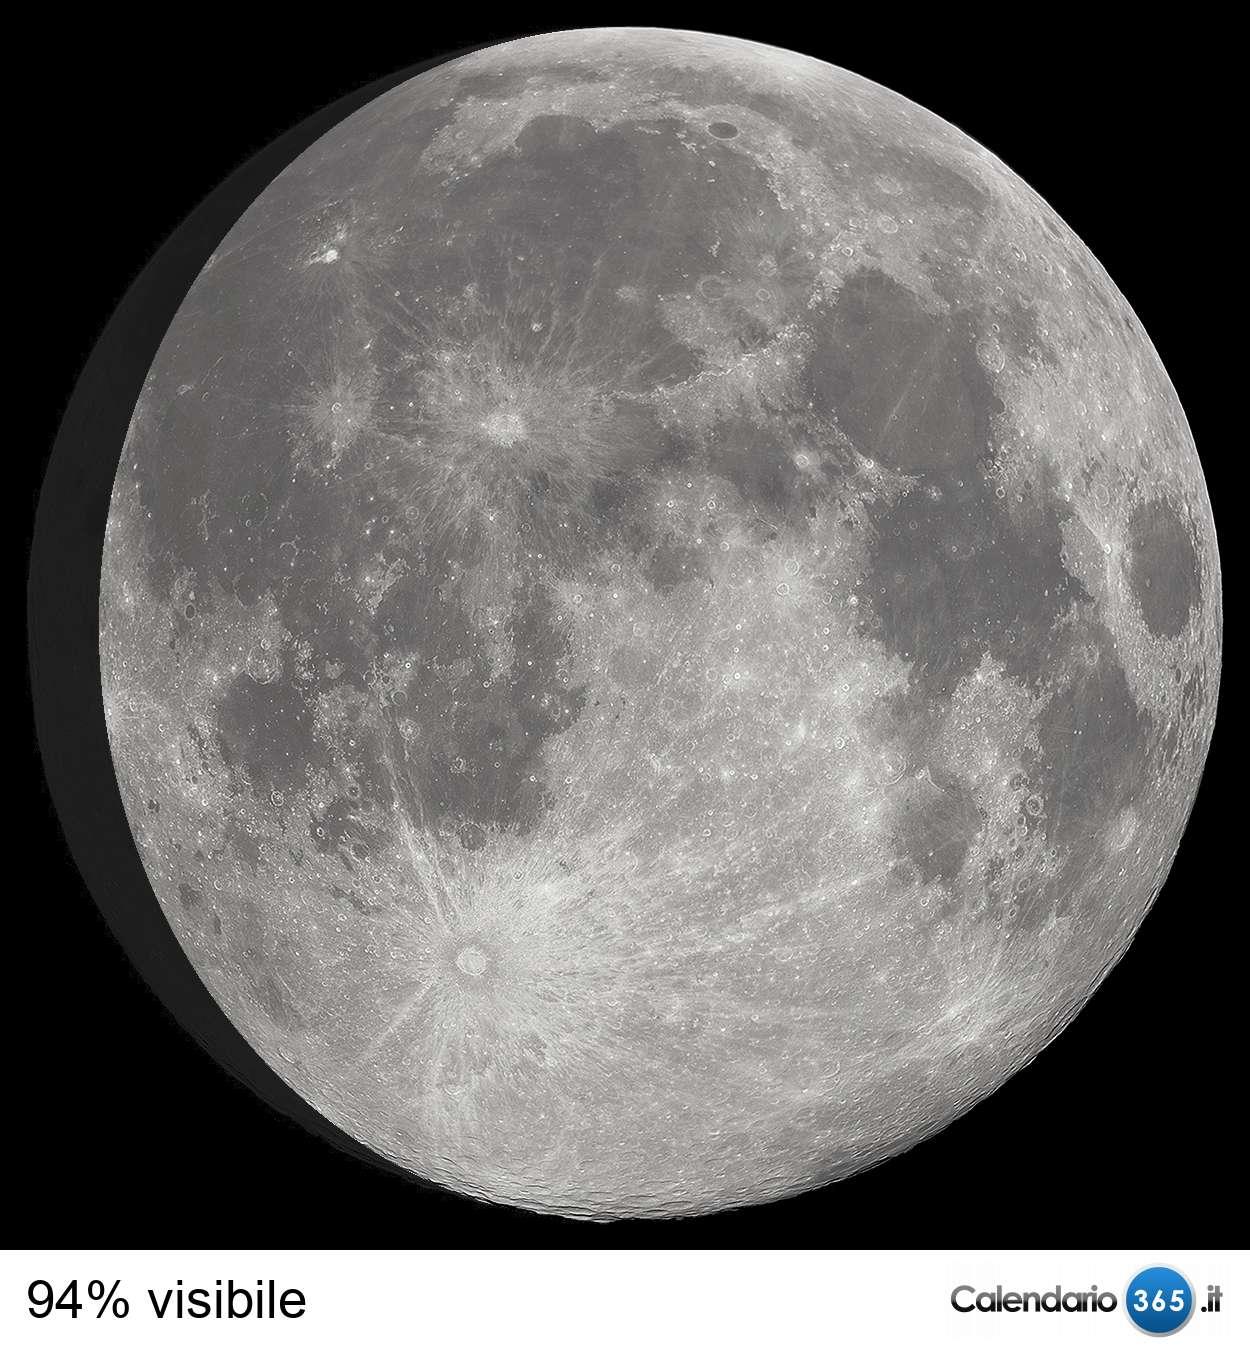 https://www.calendario-365.it/images/luna_it/luna_-0_94.jpg